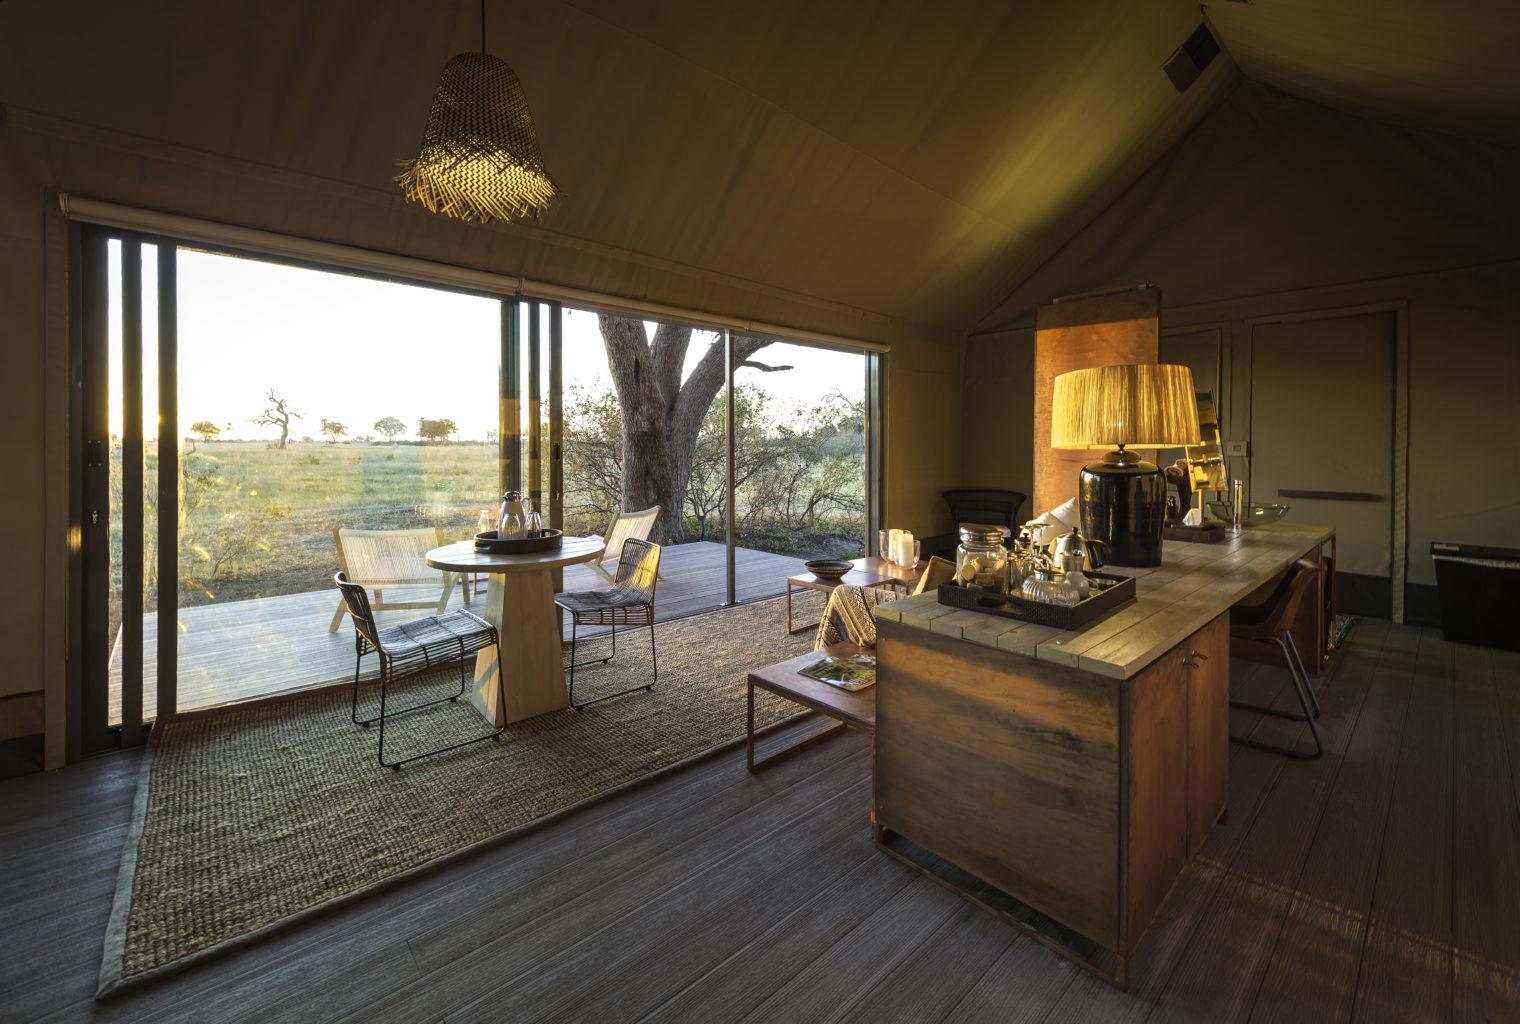 Linkwasha-Zimbabwe-Lounge